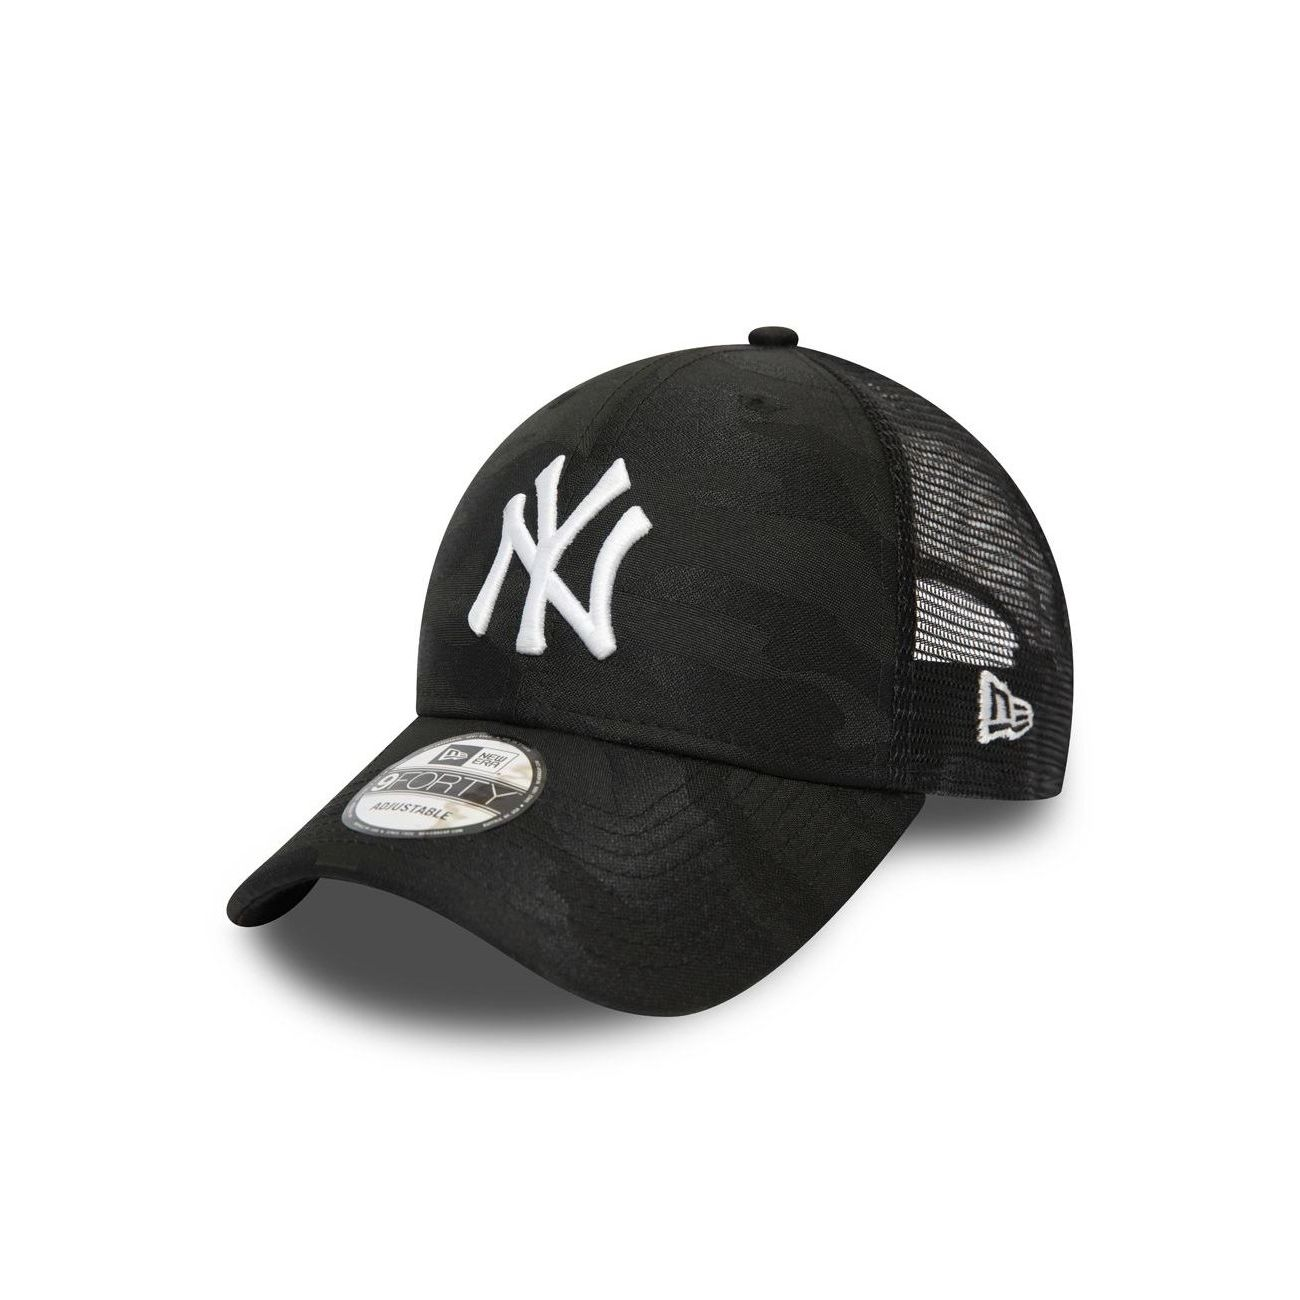 Mode- Lifestyle enfant NEW ERA Casquette enfant 9FORTY New York Yankees